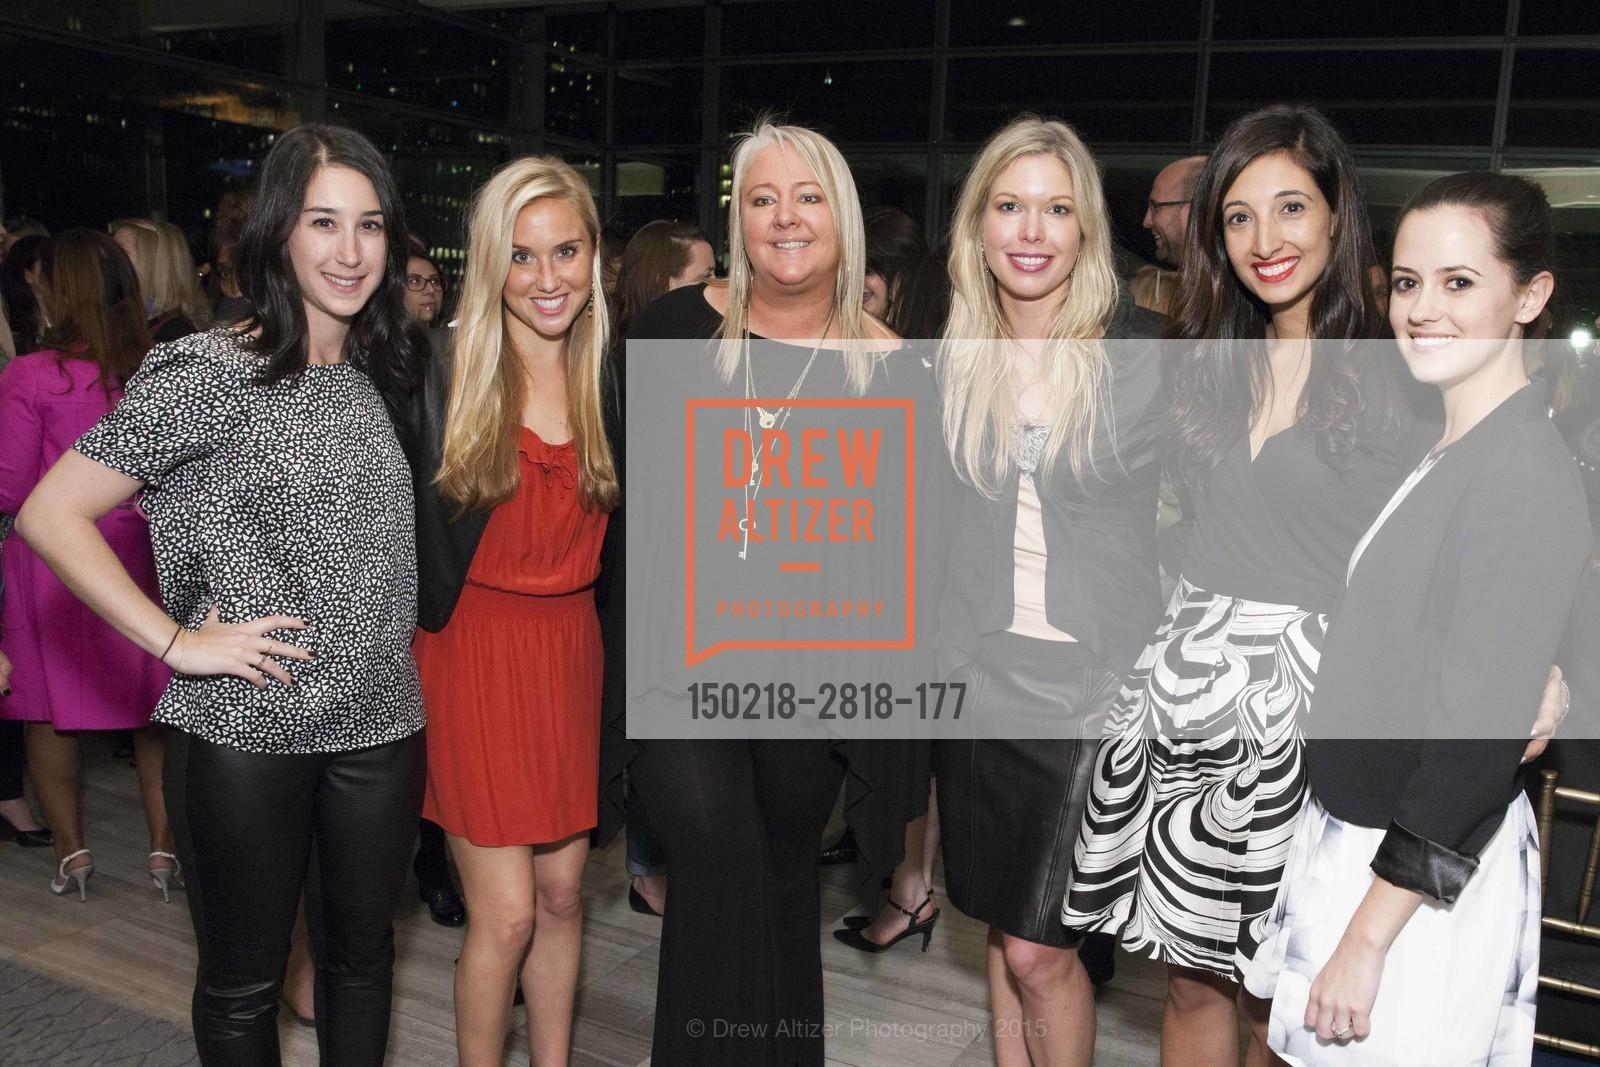 Dina Rosenberg, Allison Frazier, Lori Puccinelli Stern, Liz Whitman, Katina Mountanos, Carly Lojacono, Photo #150218-2818-177